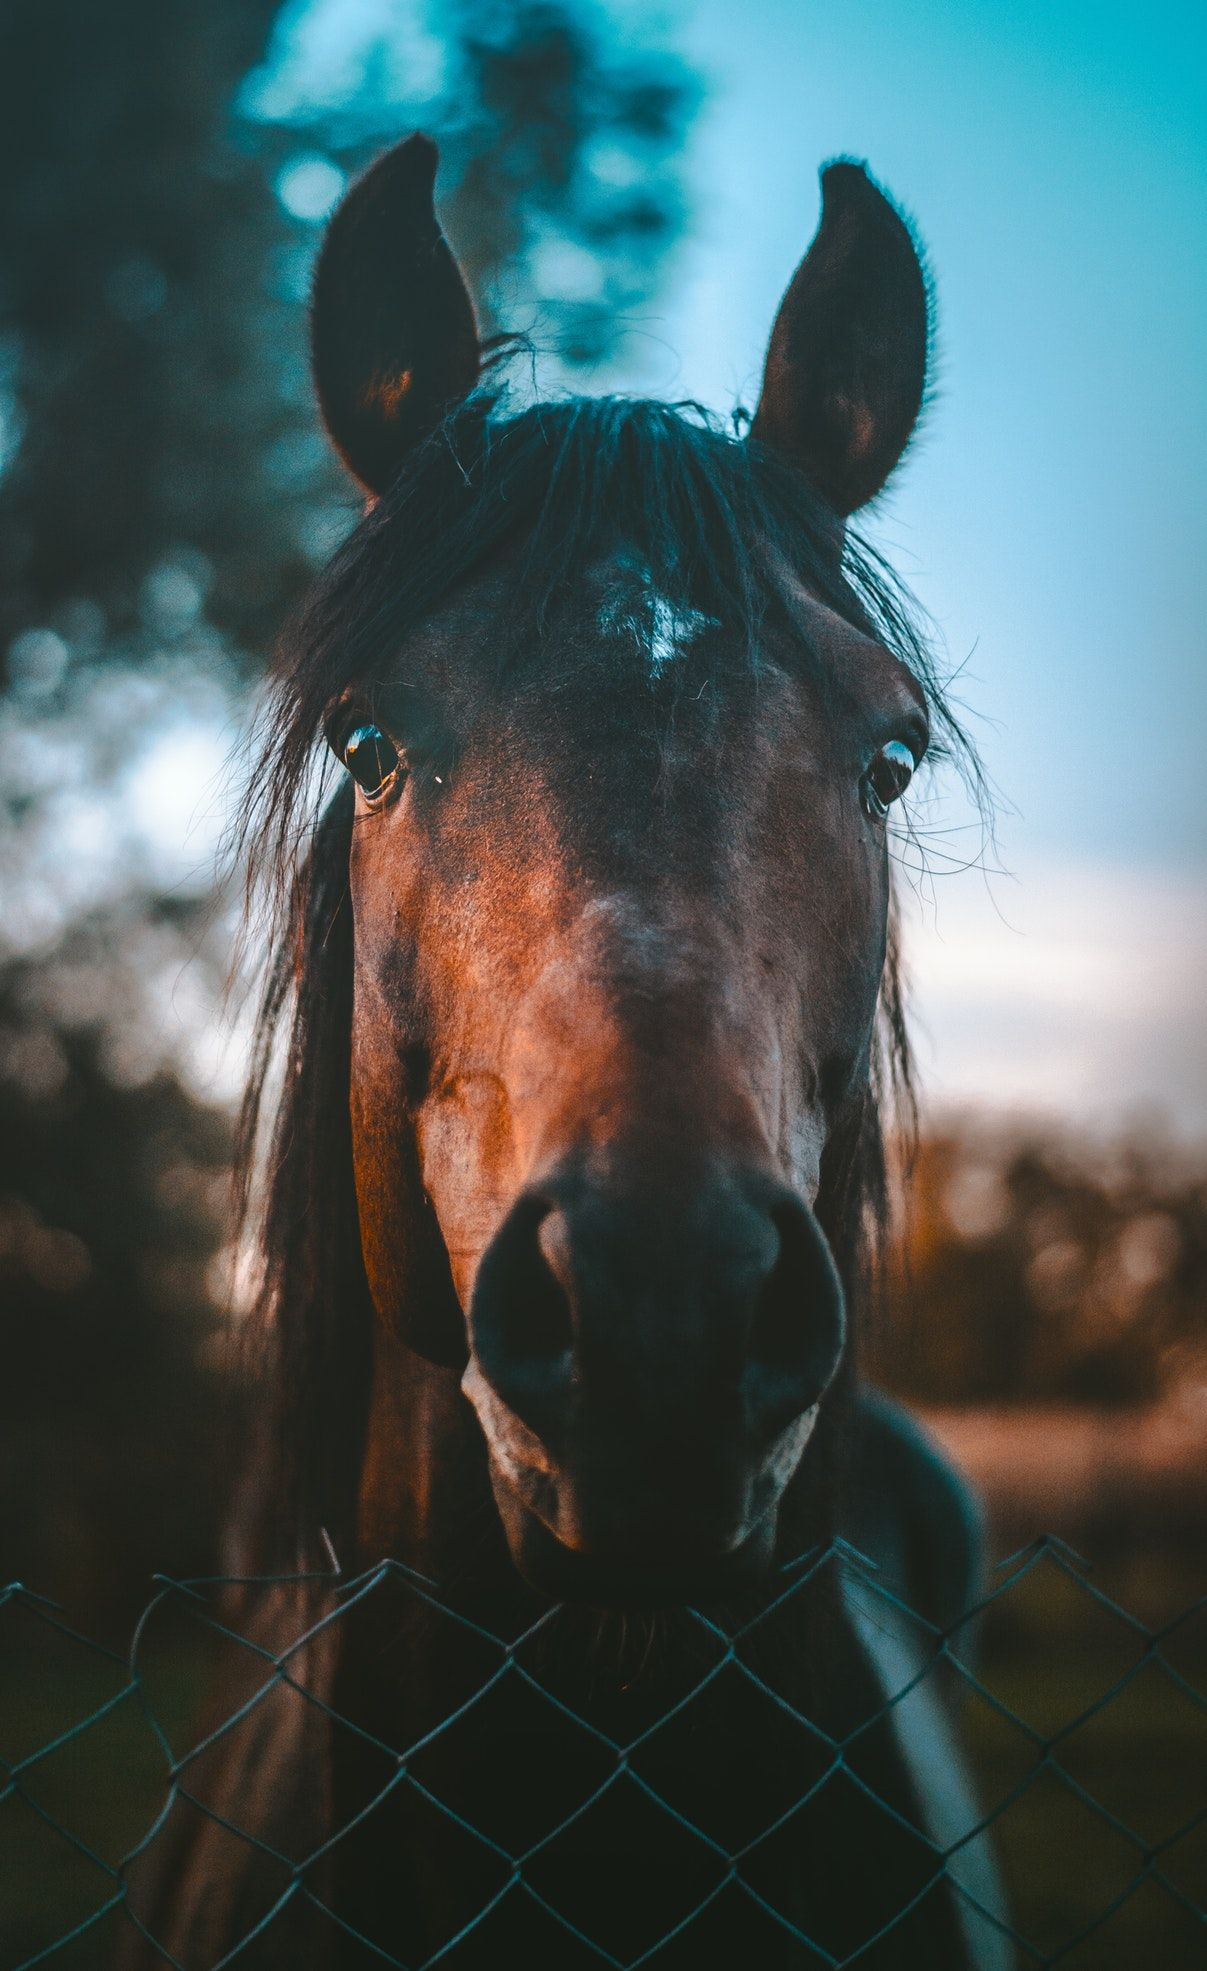 Horse Colour Wallpaper You'll Love